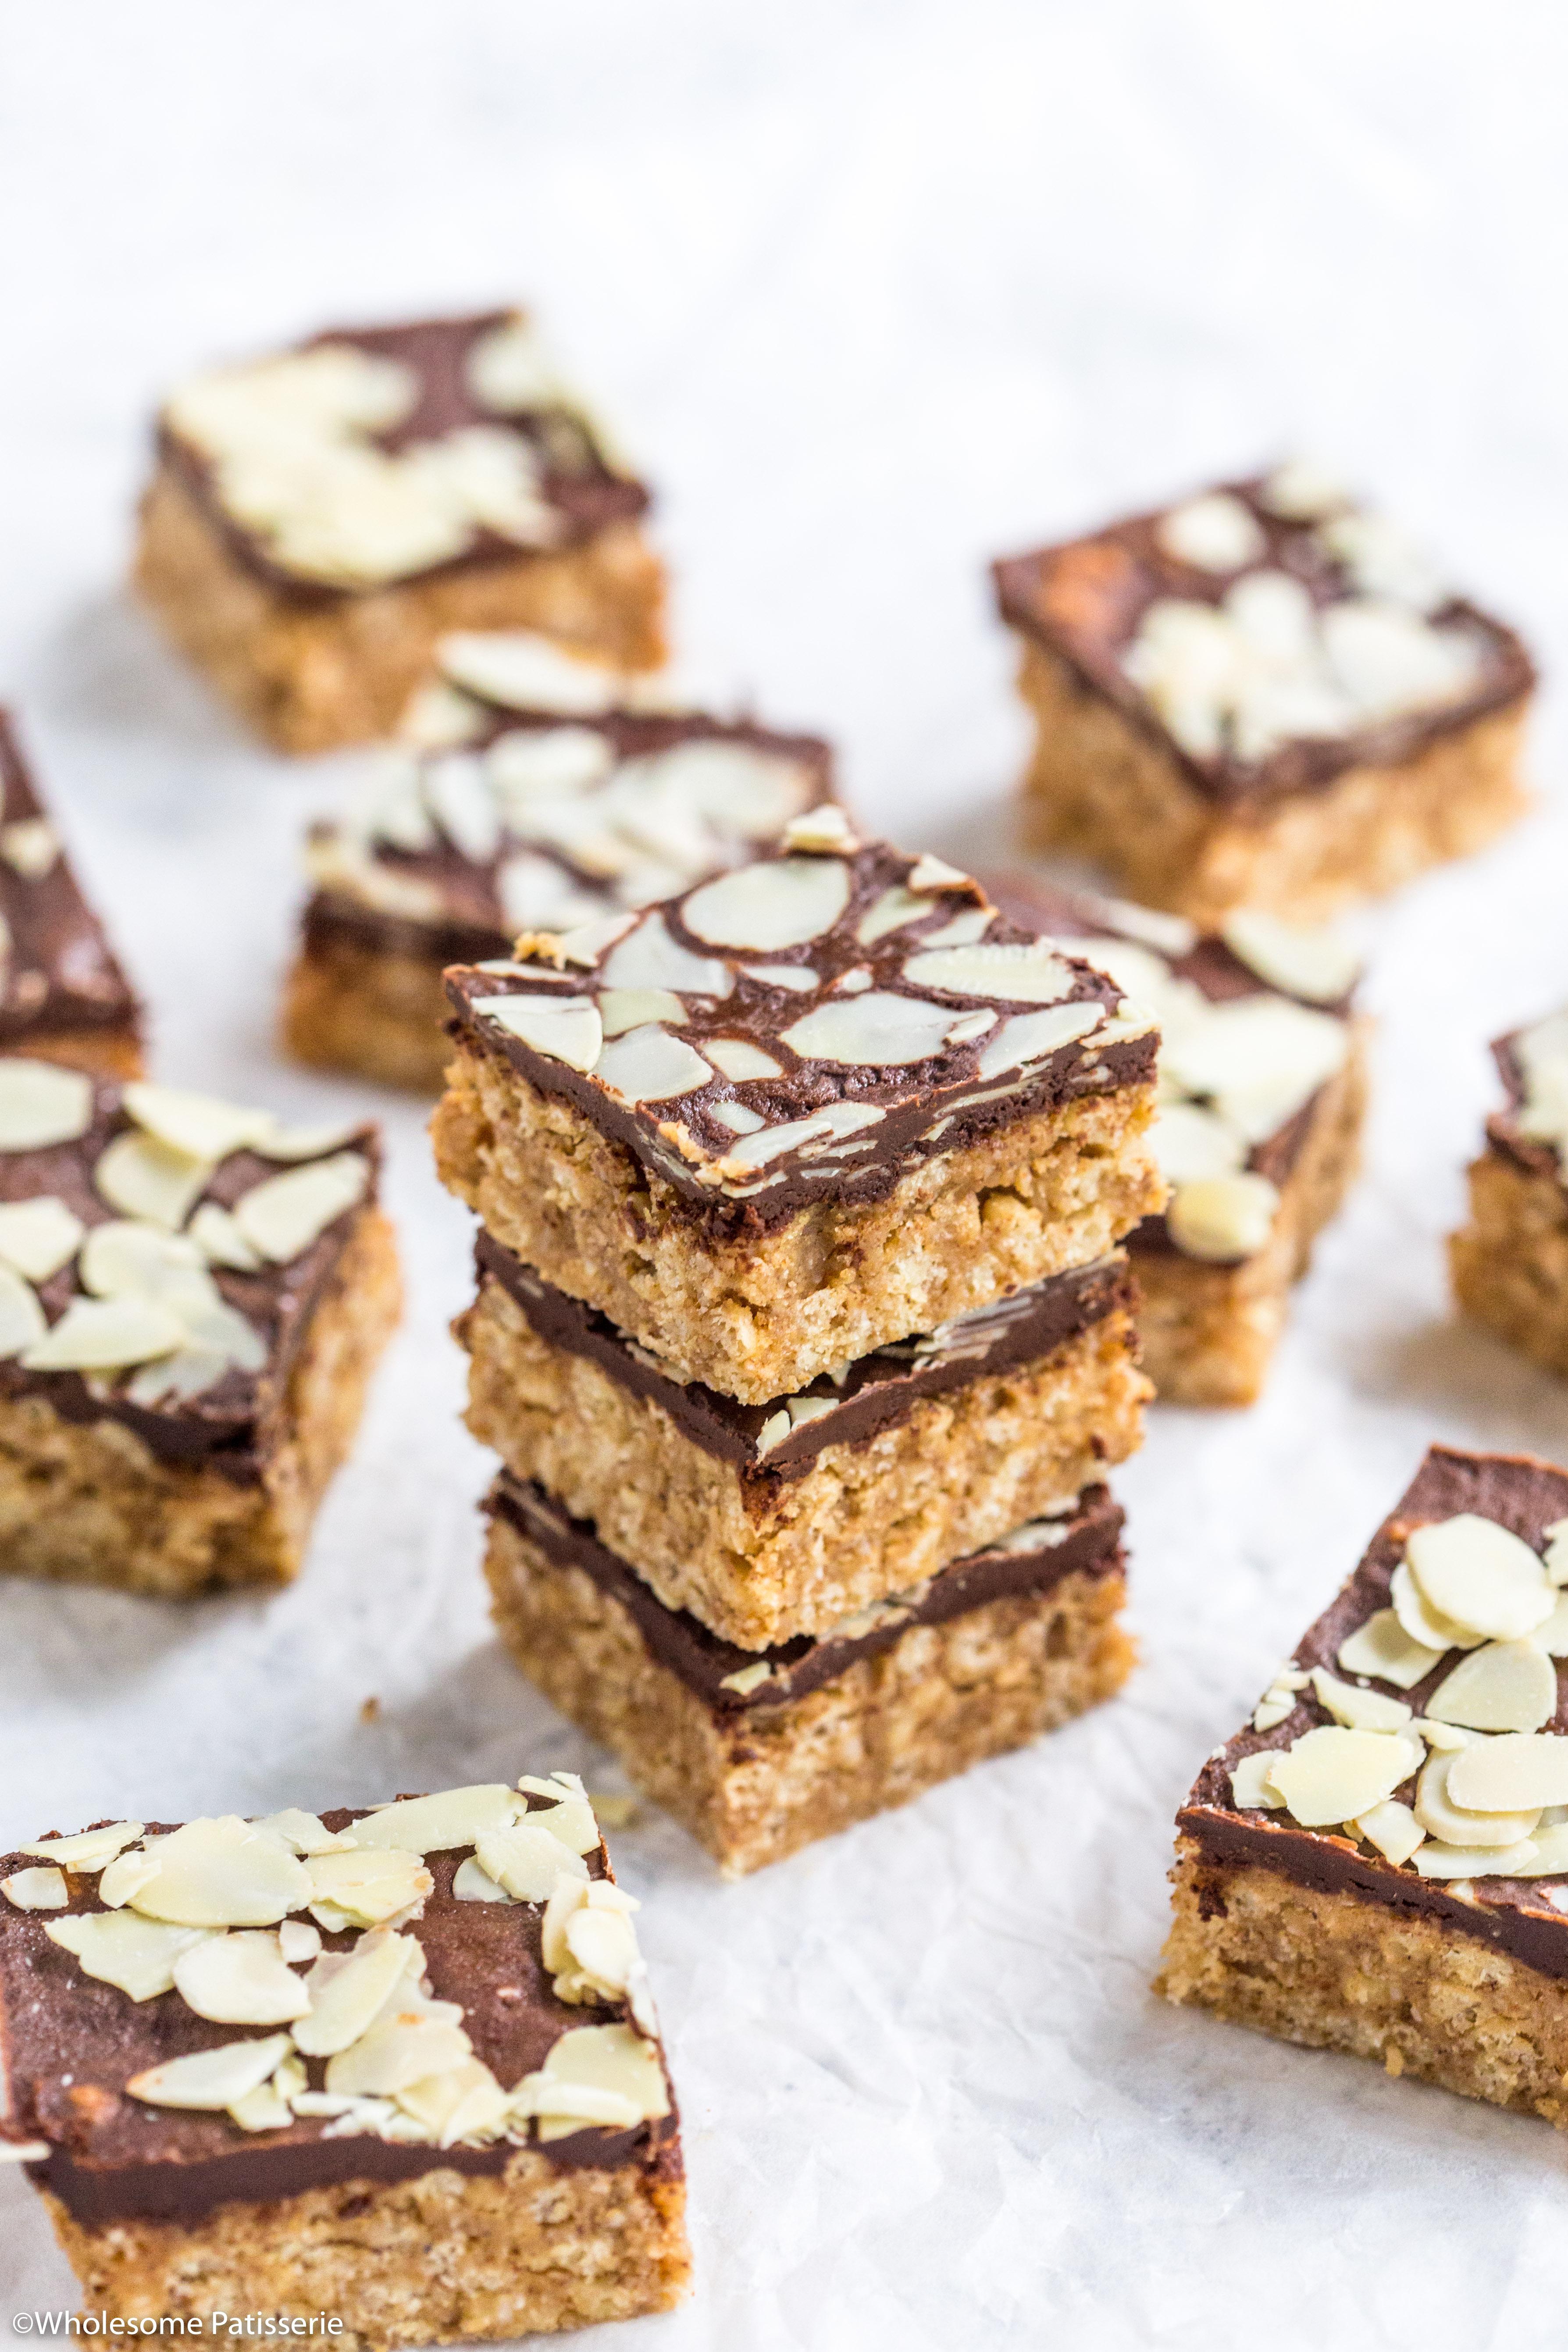 Almond Butter Chocolate Crispy Bars